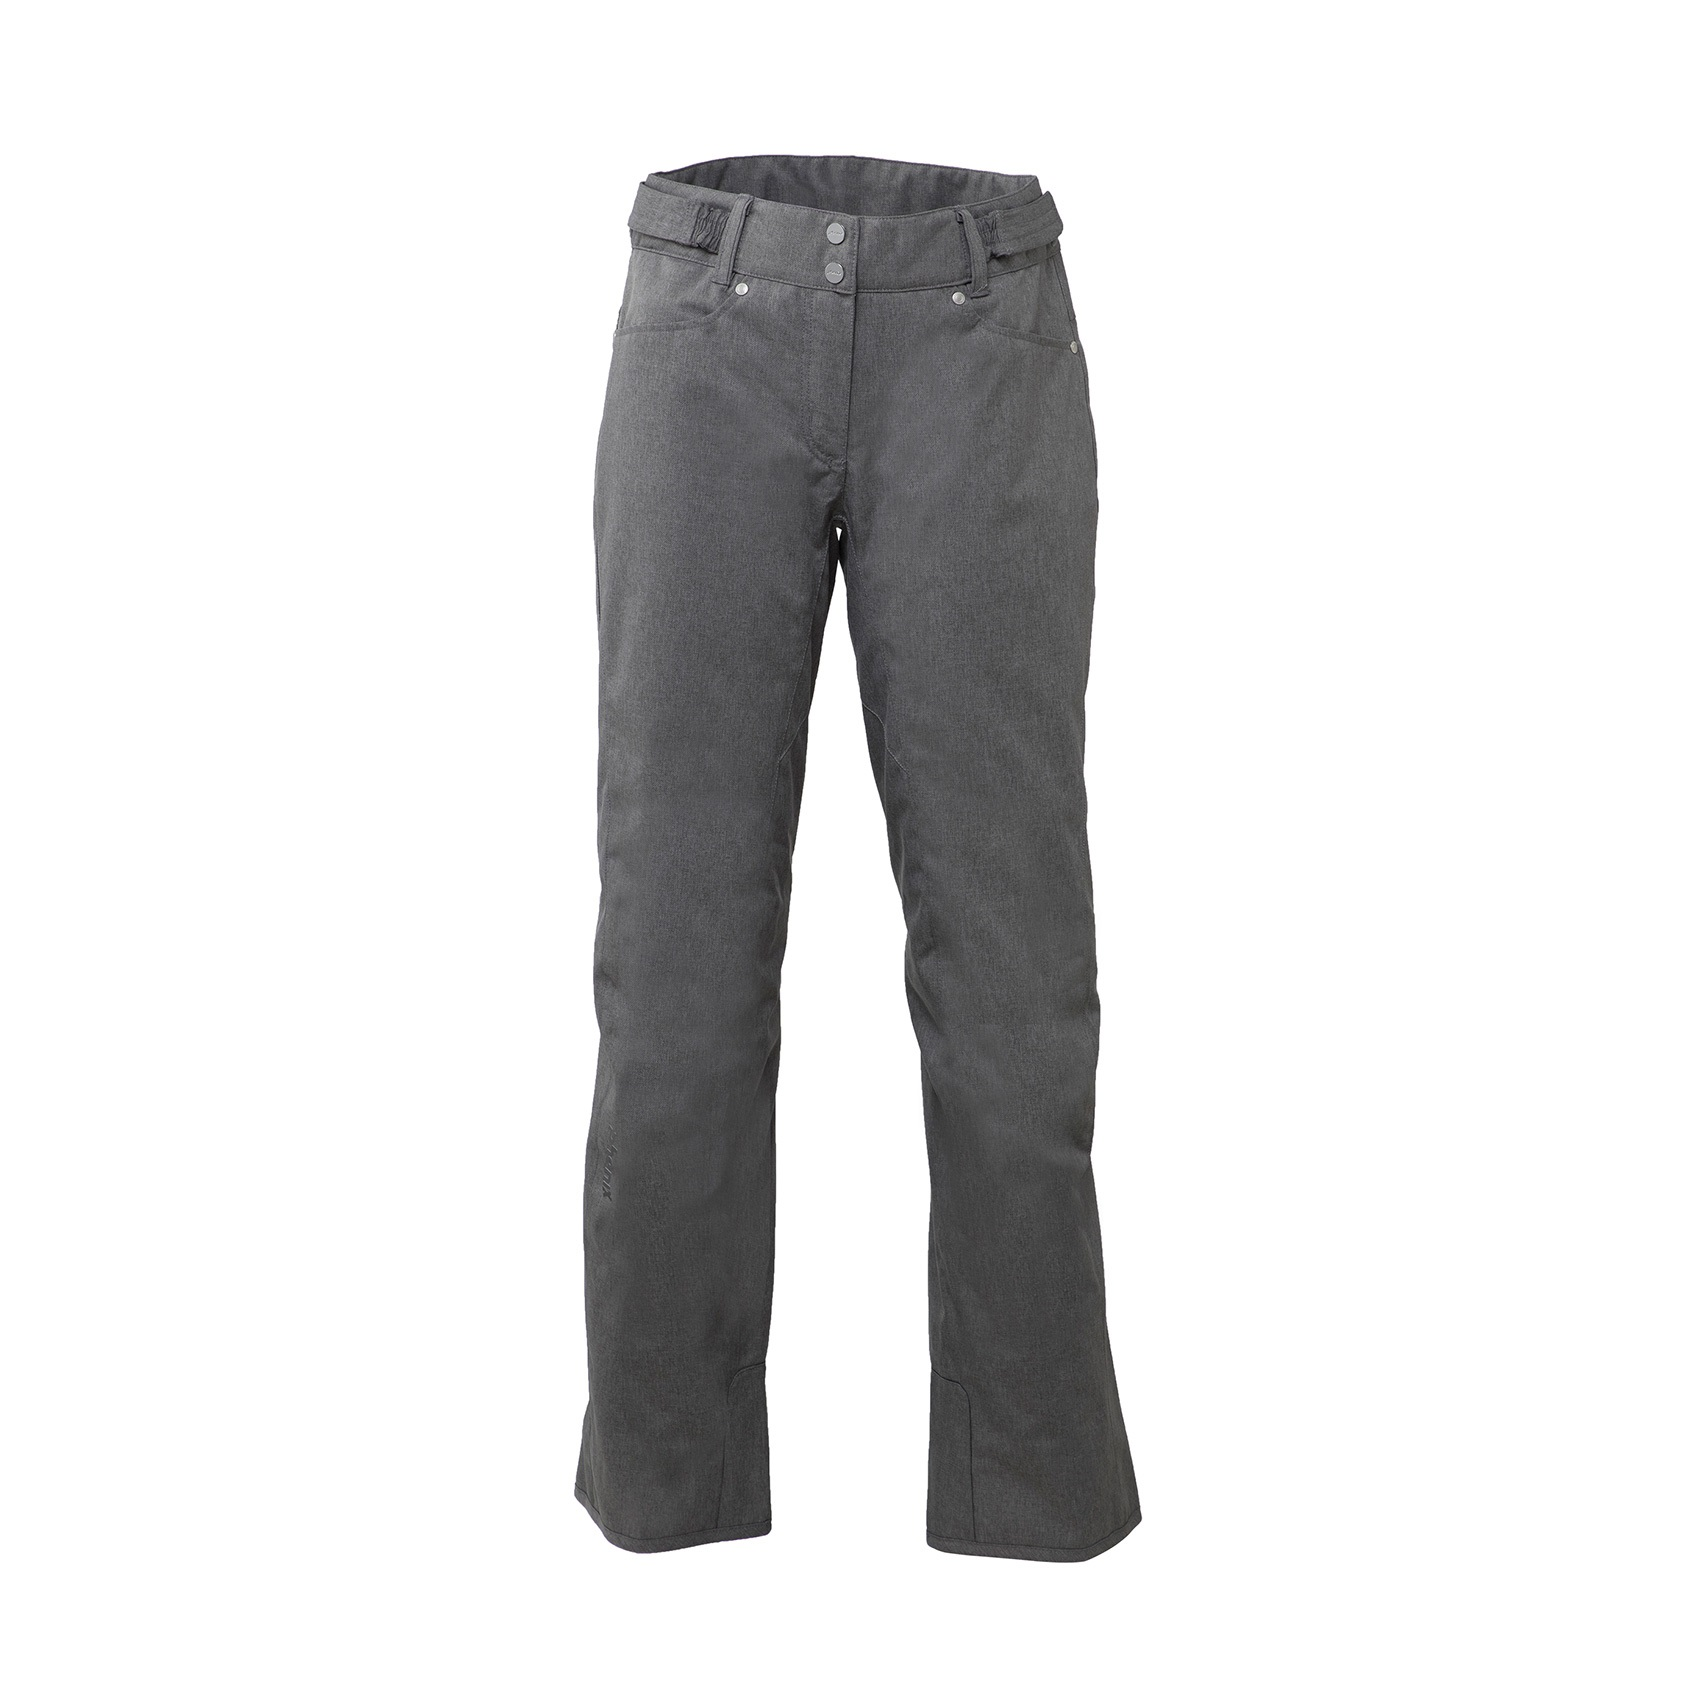 VIRGIN par Phenix (Pantalons isolés femmes, Vêtements hiver femme)VIRGIN par Phenix (Pantalons isolés femmes, Vêtements hiver femme)